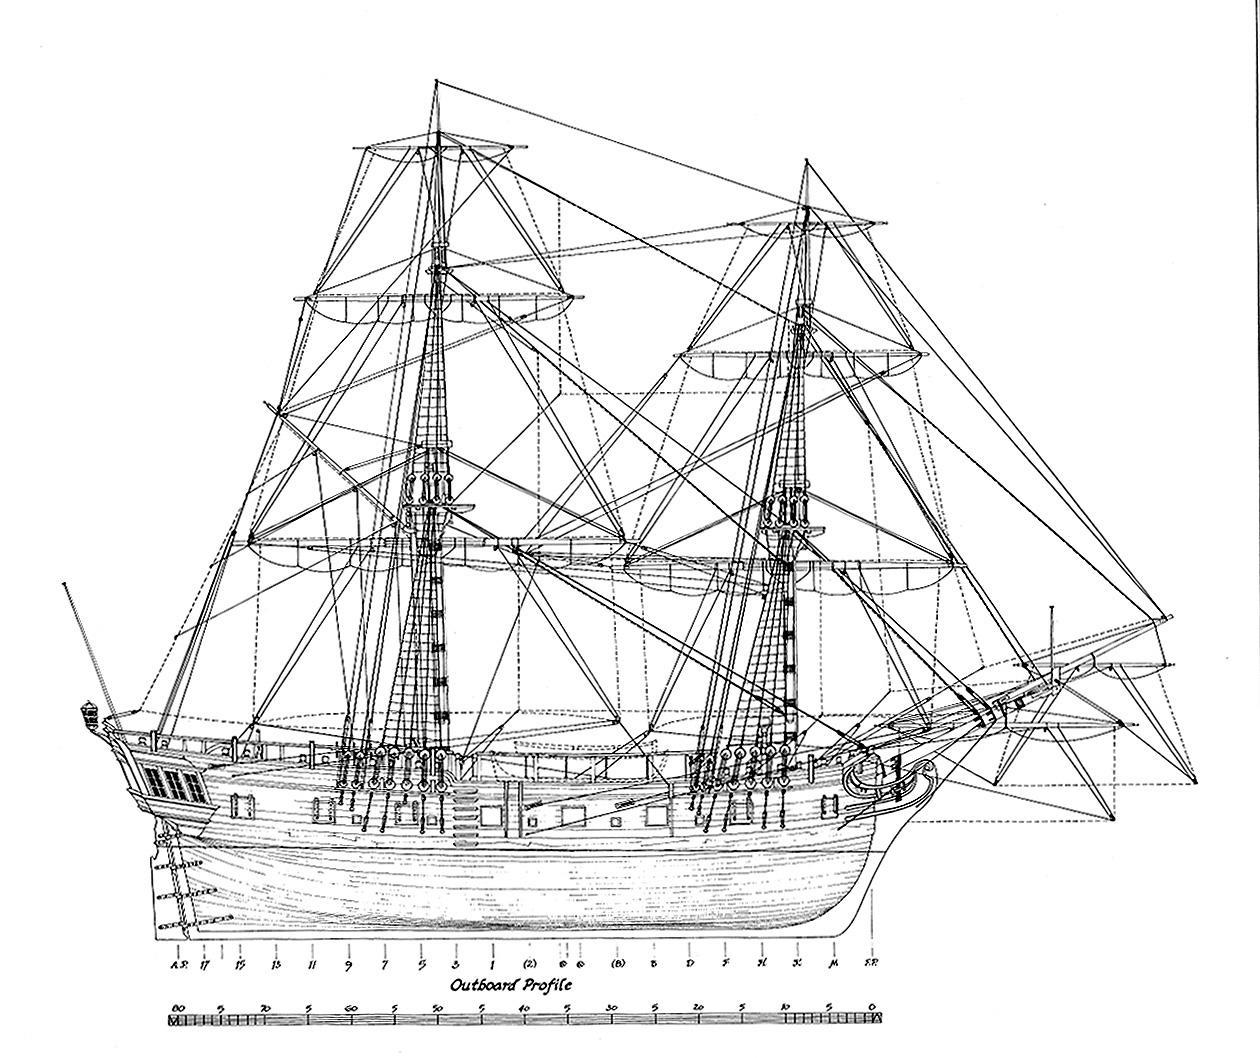 Hms Ontario Starboard Profile